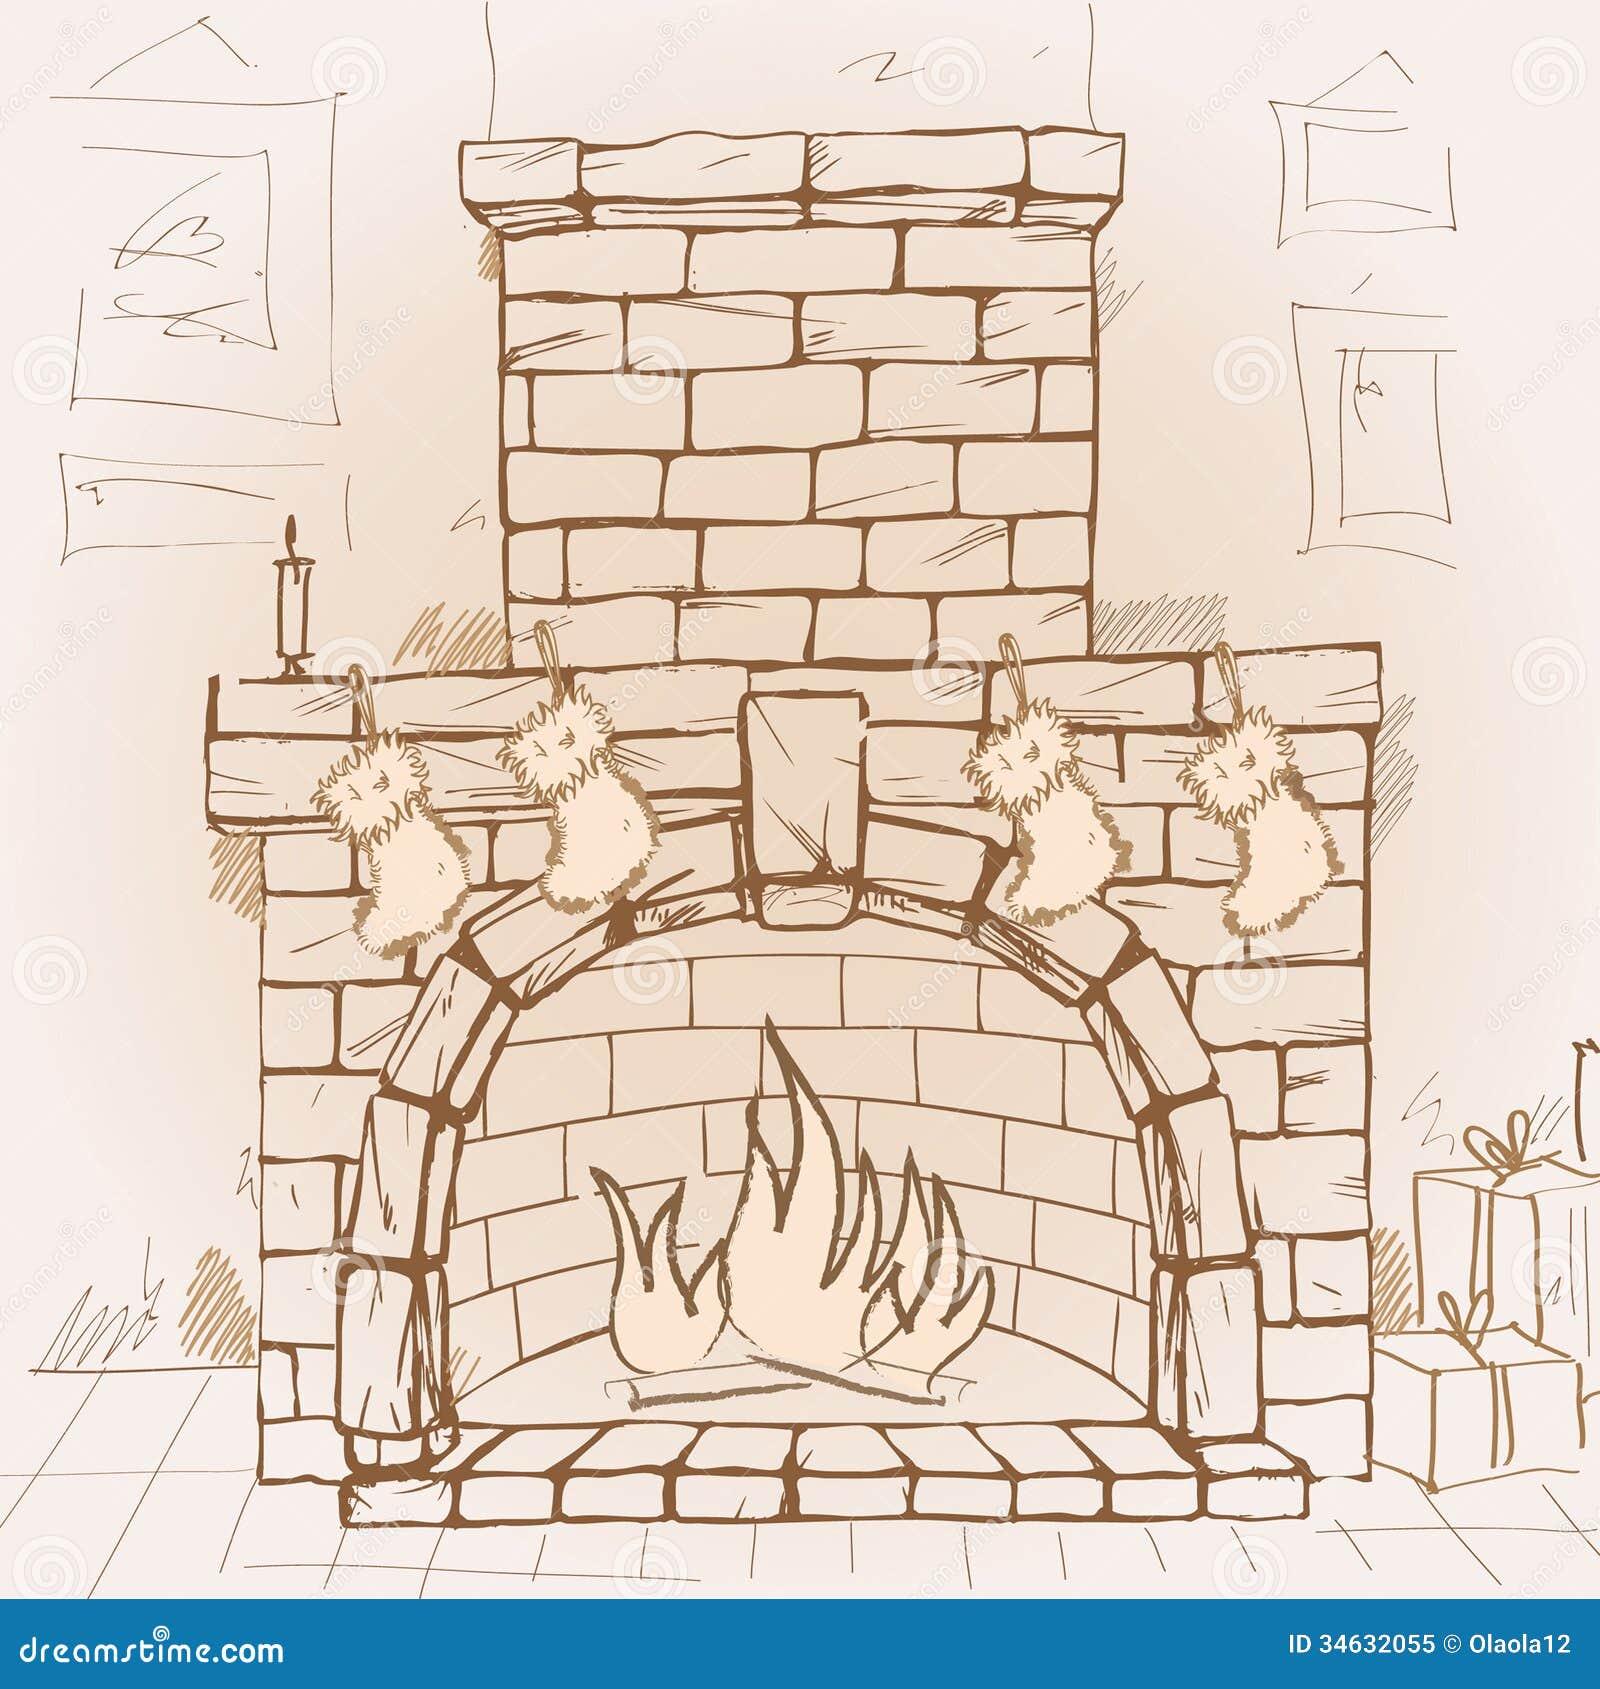 Fireplace Royalty Free Stock Photo - Image: 34632055